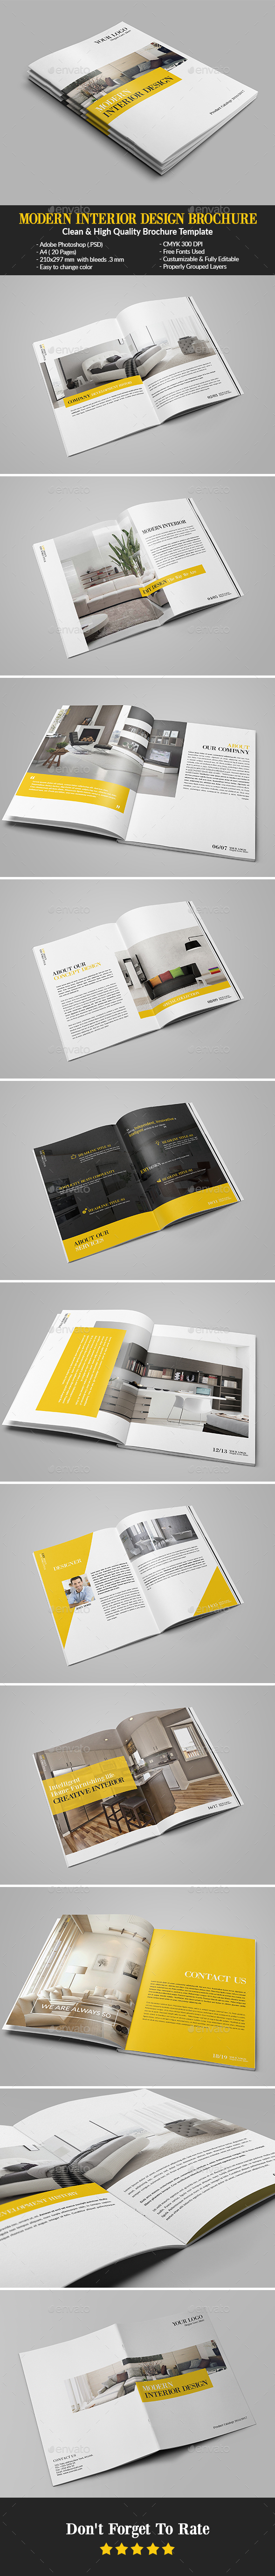 Modern Interior Design Brochure/Catalog - Catalogs Brochures